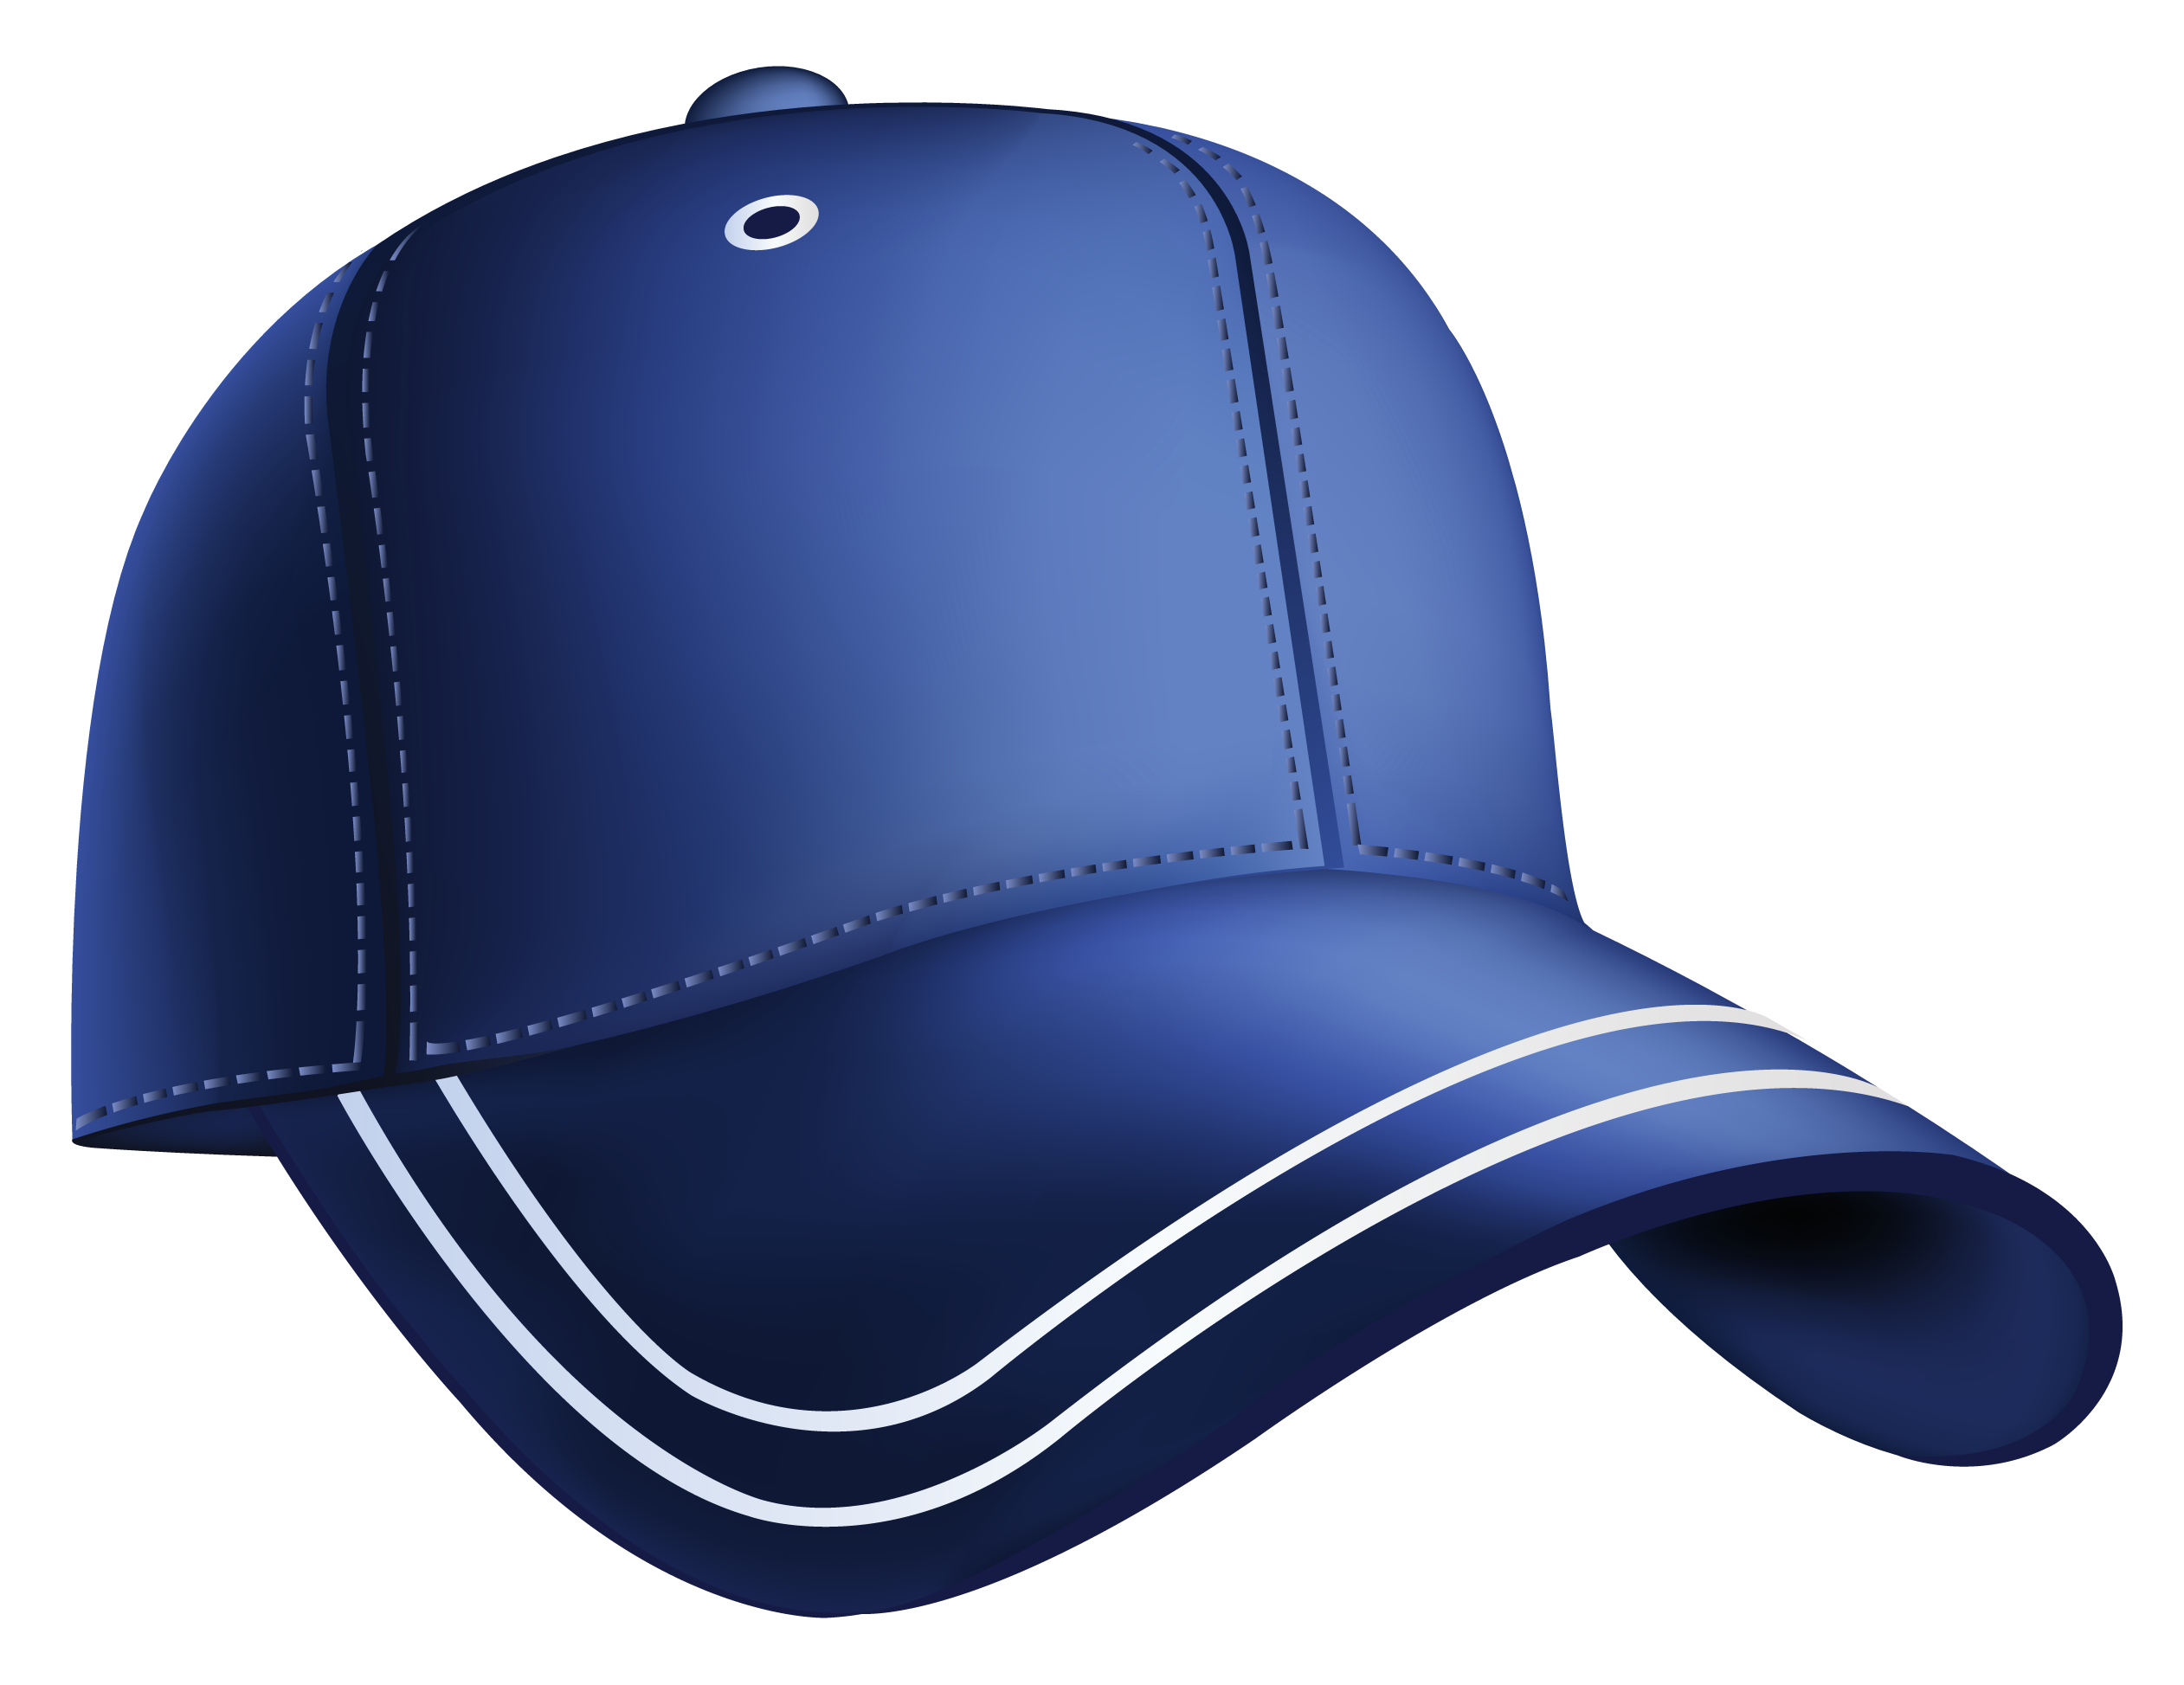 2523x1947 Blue Baseball Cap Clipartu200b Gallery Yopriceville